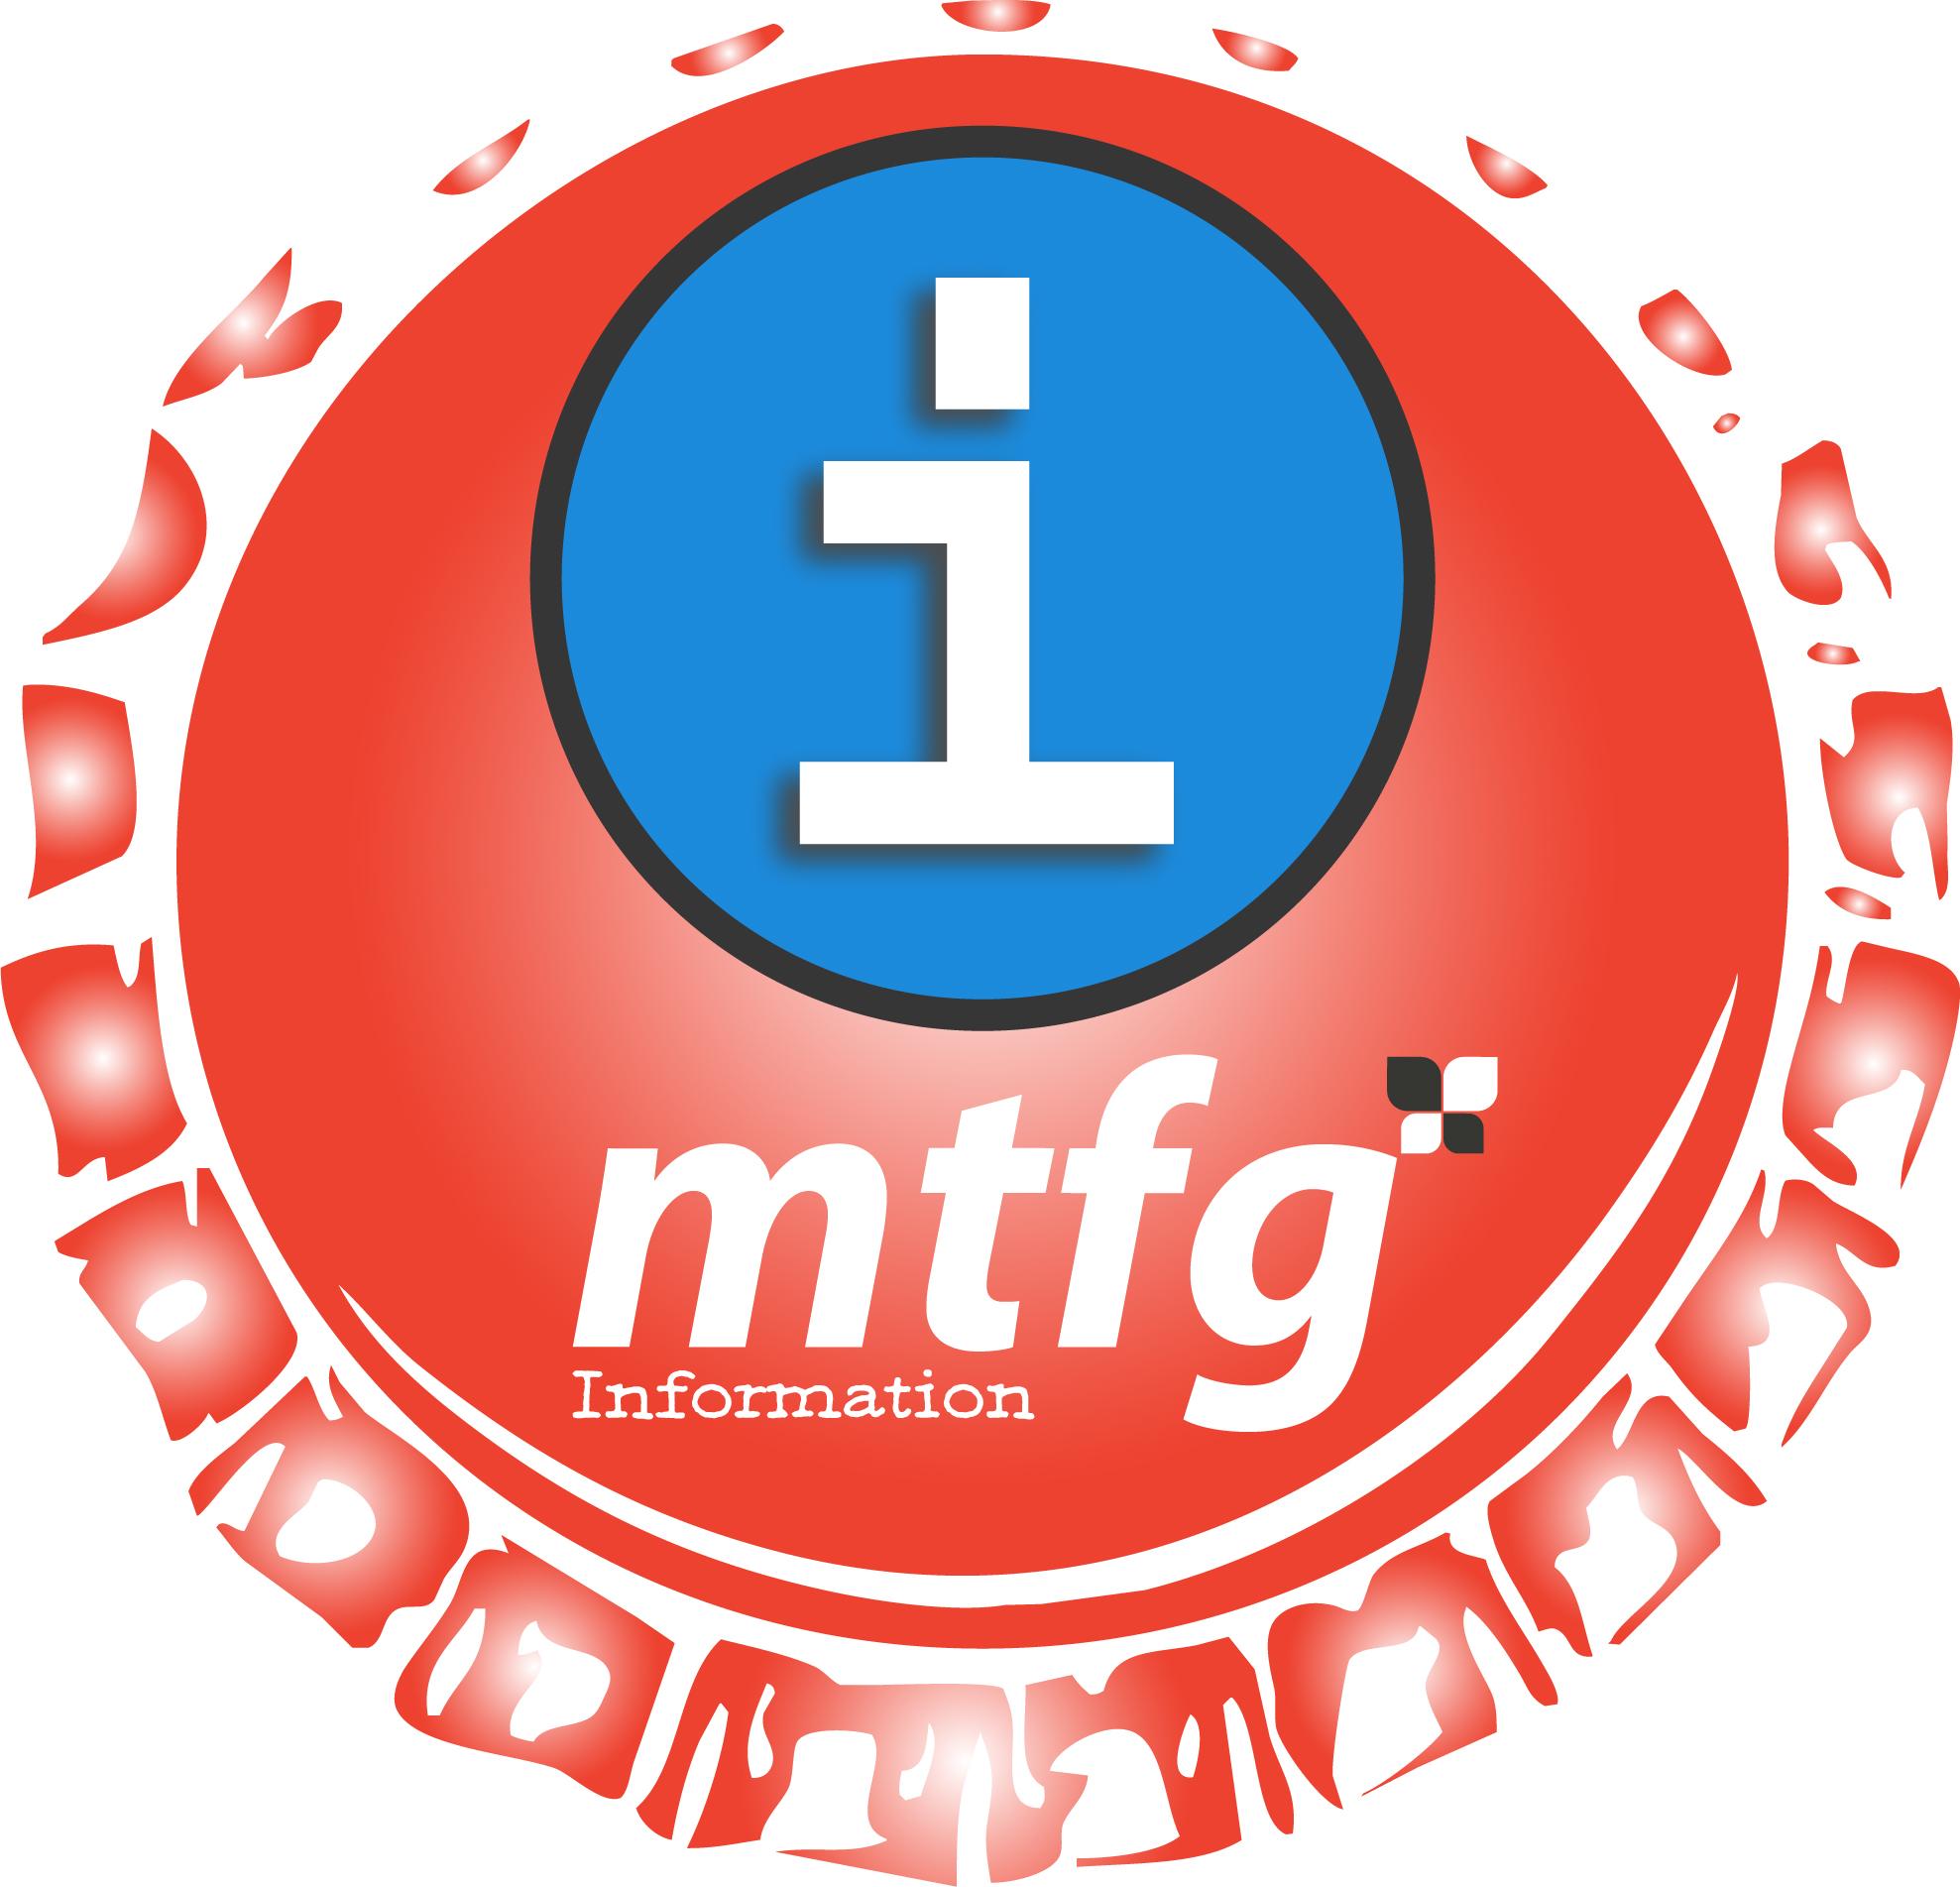 MTFG Informations